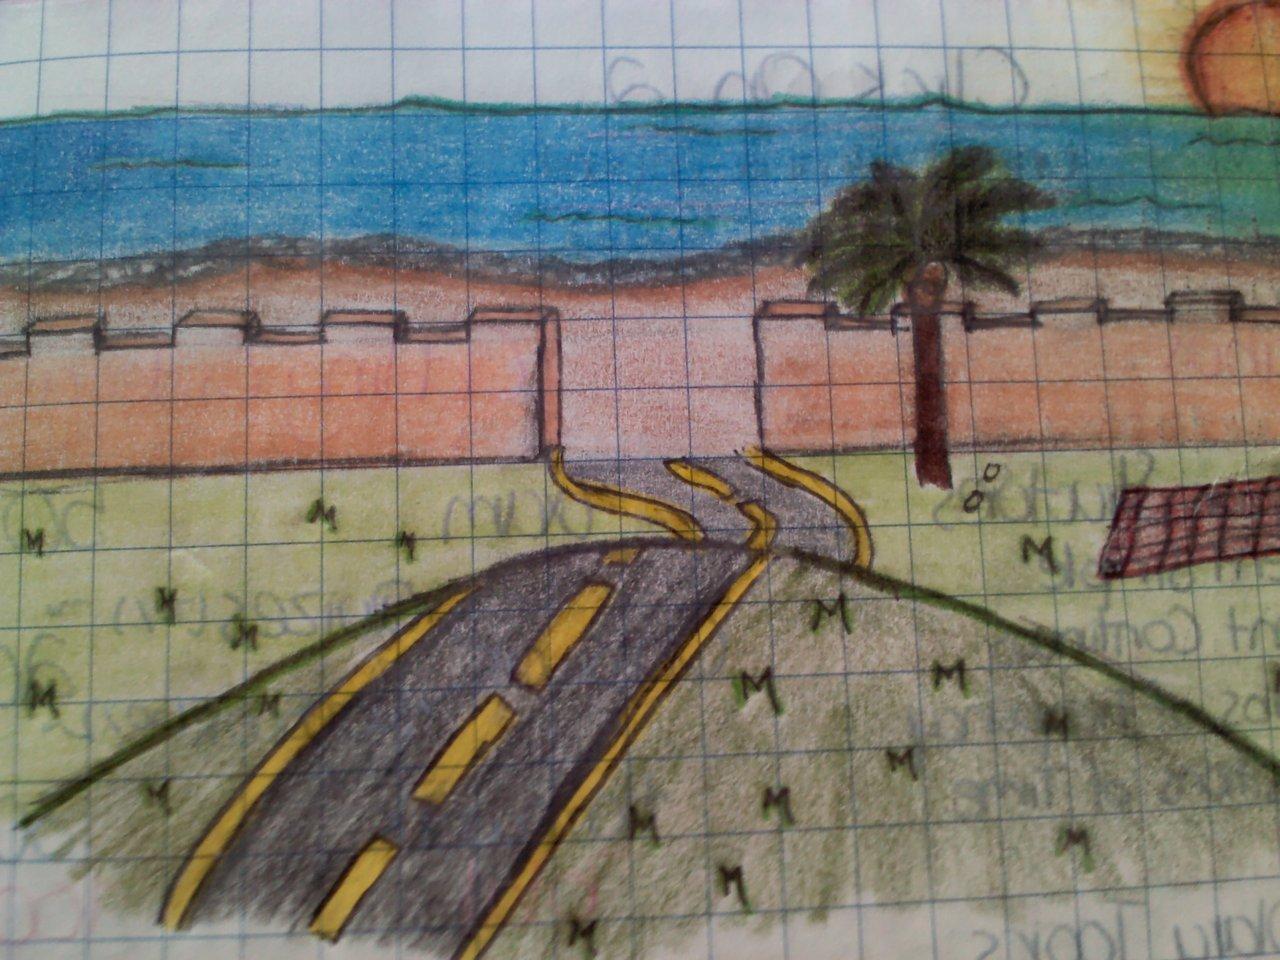 Dibujos a mano - Página 4 Tumblr_m39cwiSGum1ro6f9po2_1280